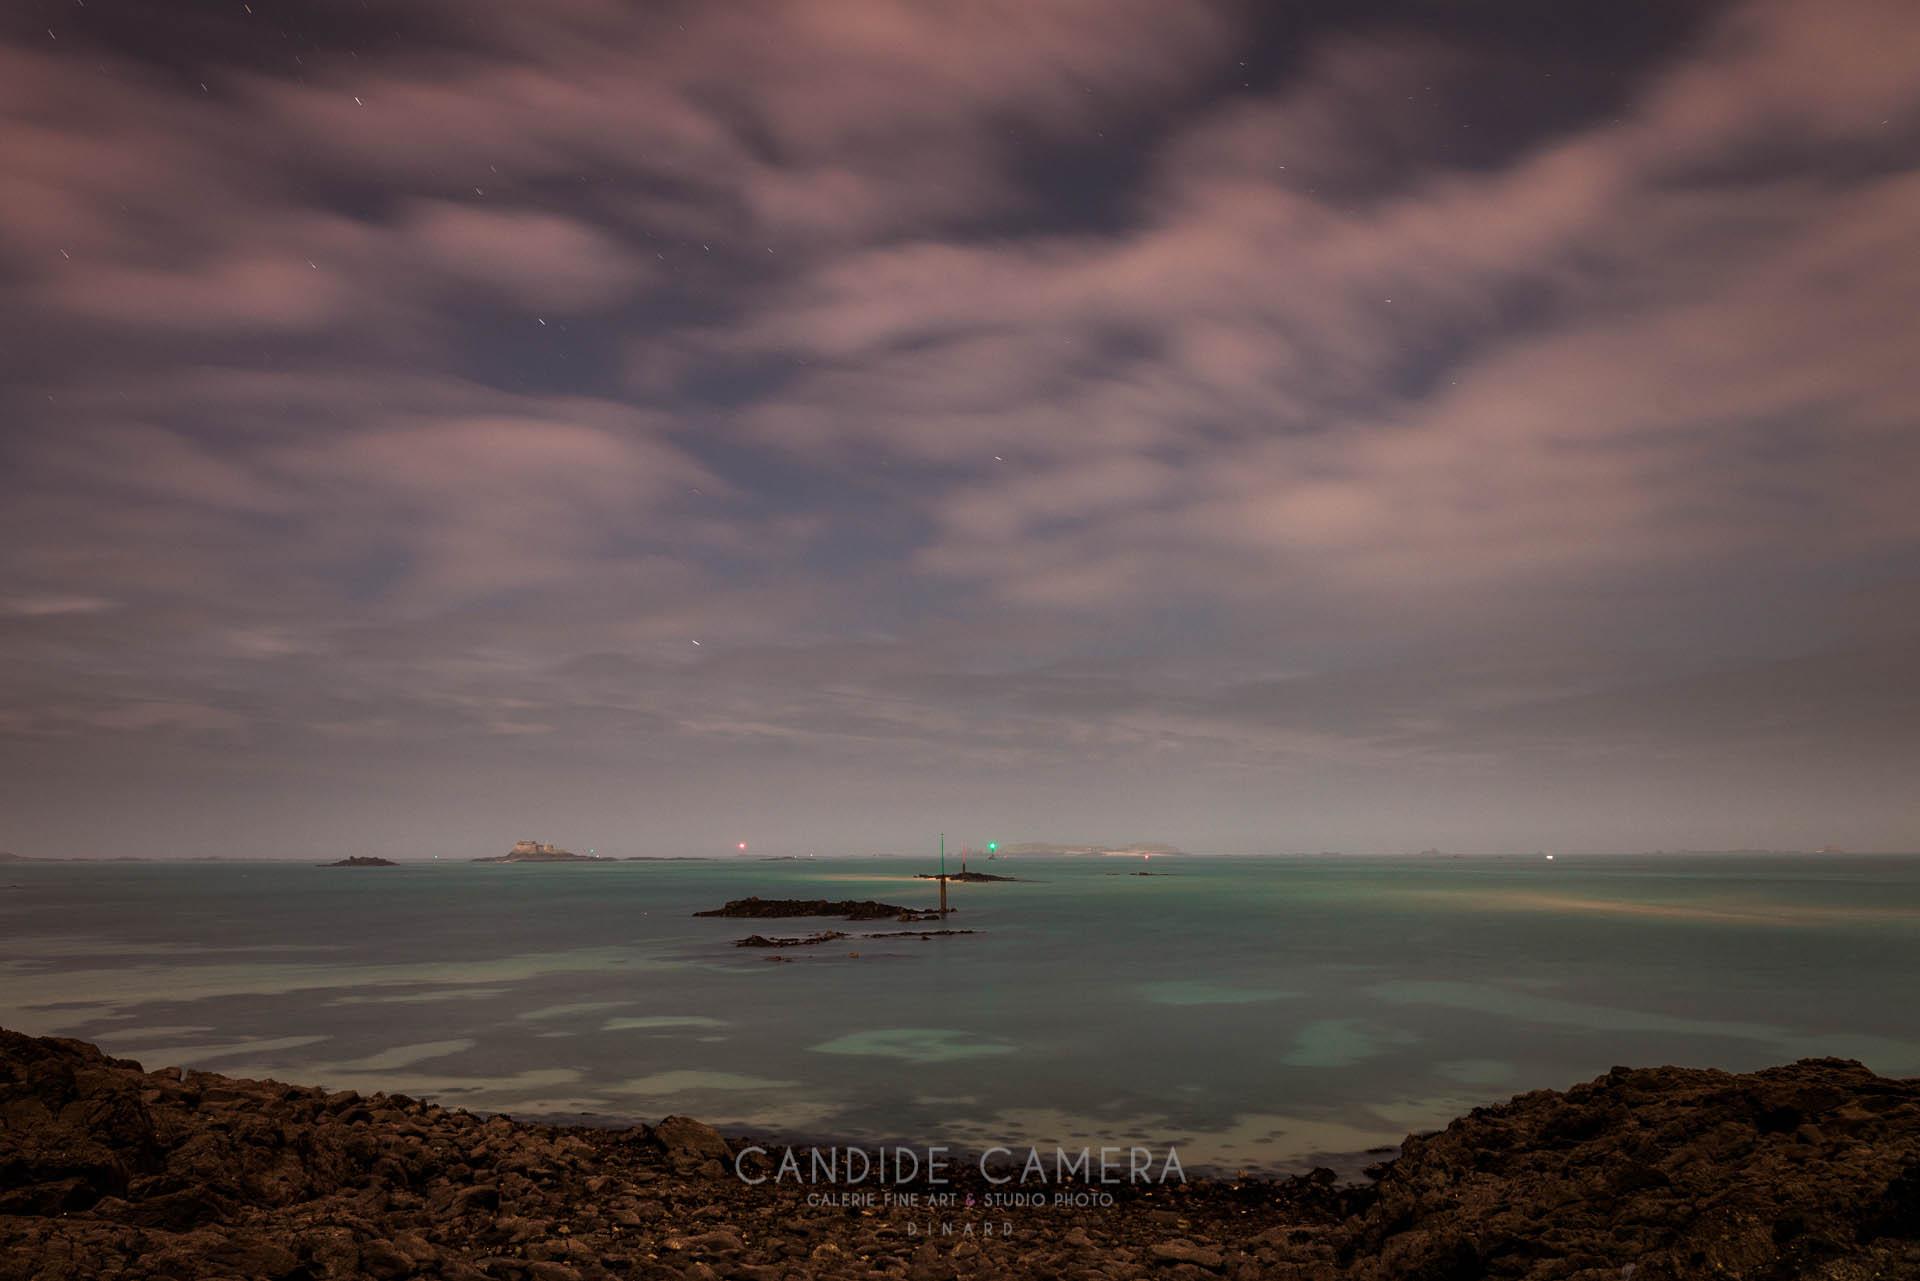 GALERIE_CANDIDE_CAMERA_PHOTOGRAPHE_DINARD PLEINE LUNE1